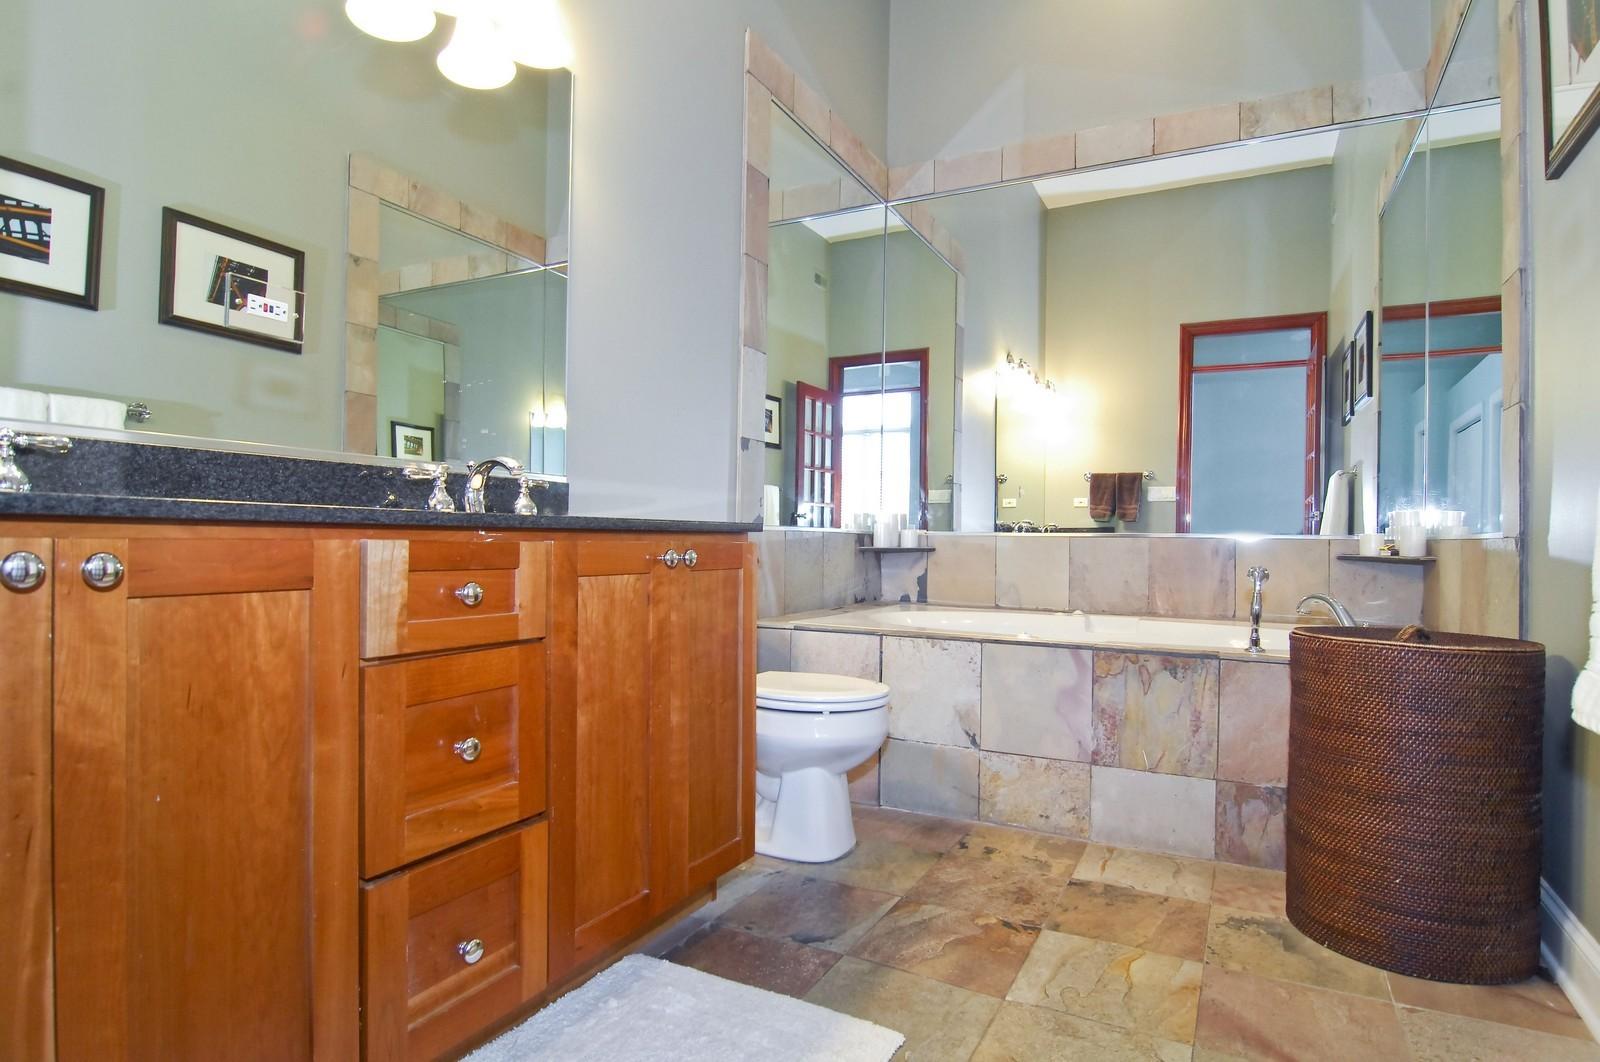 Real Estate Photography - 1865 N Winnebago, Unit 4, Chicago, IL, 60647 - Master Bathroom